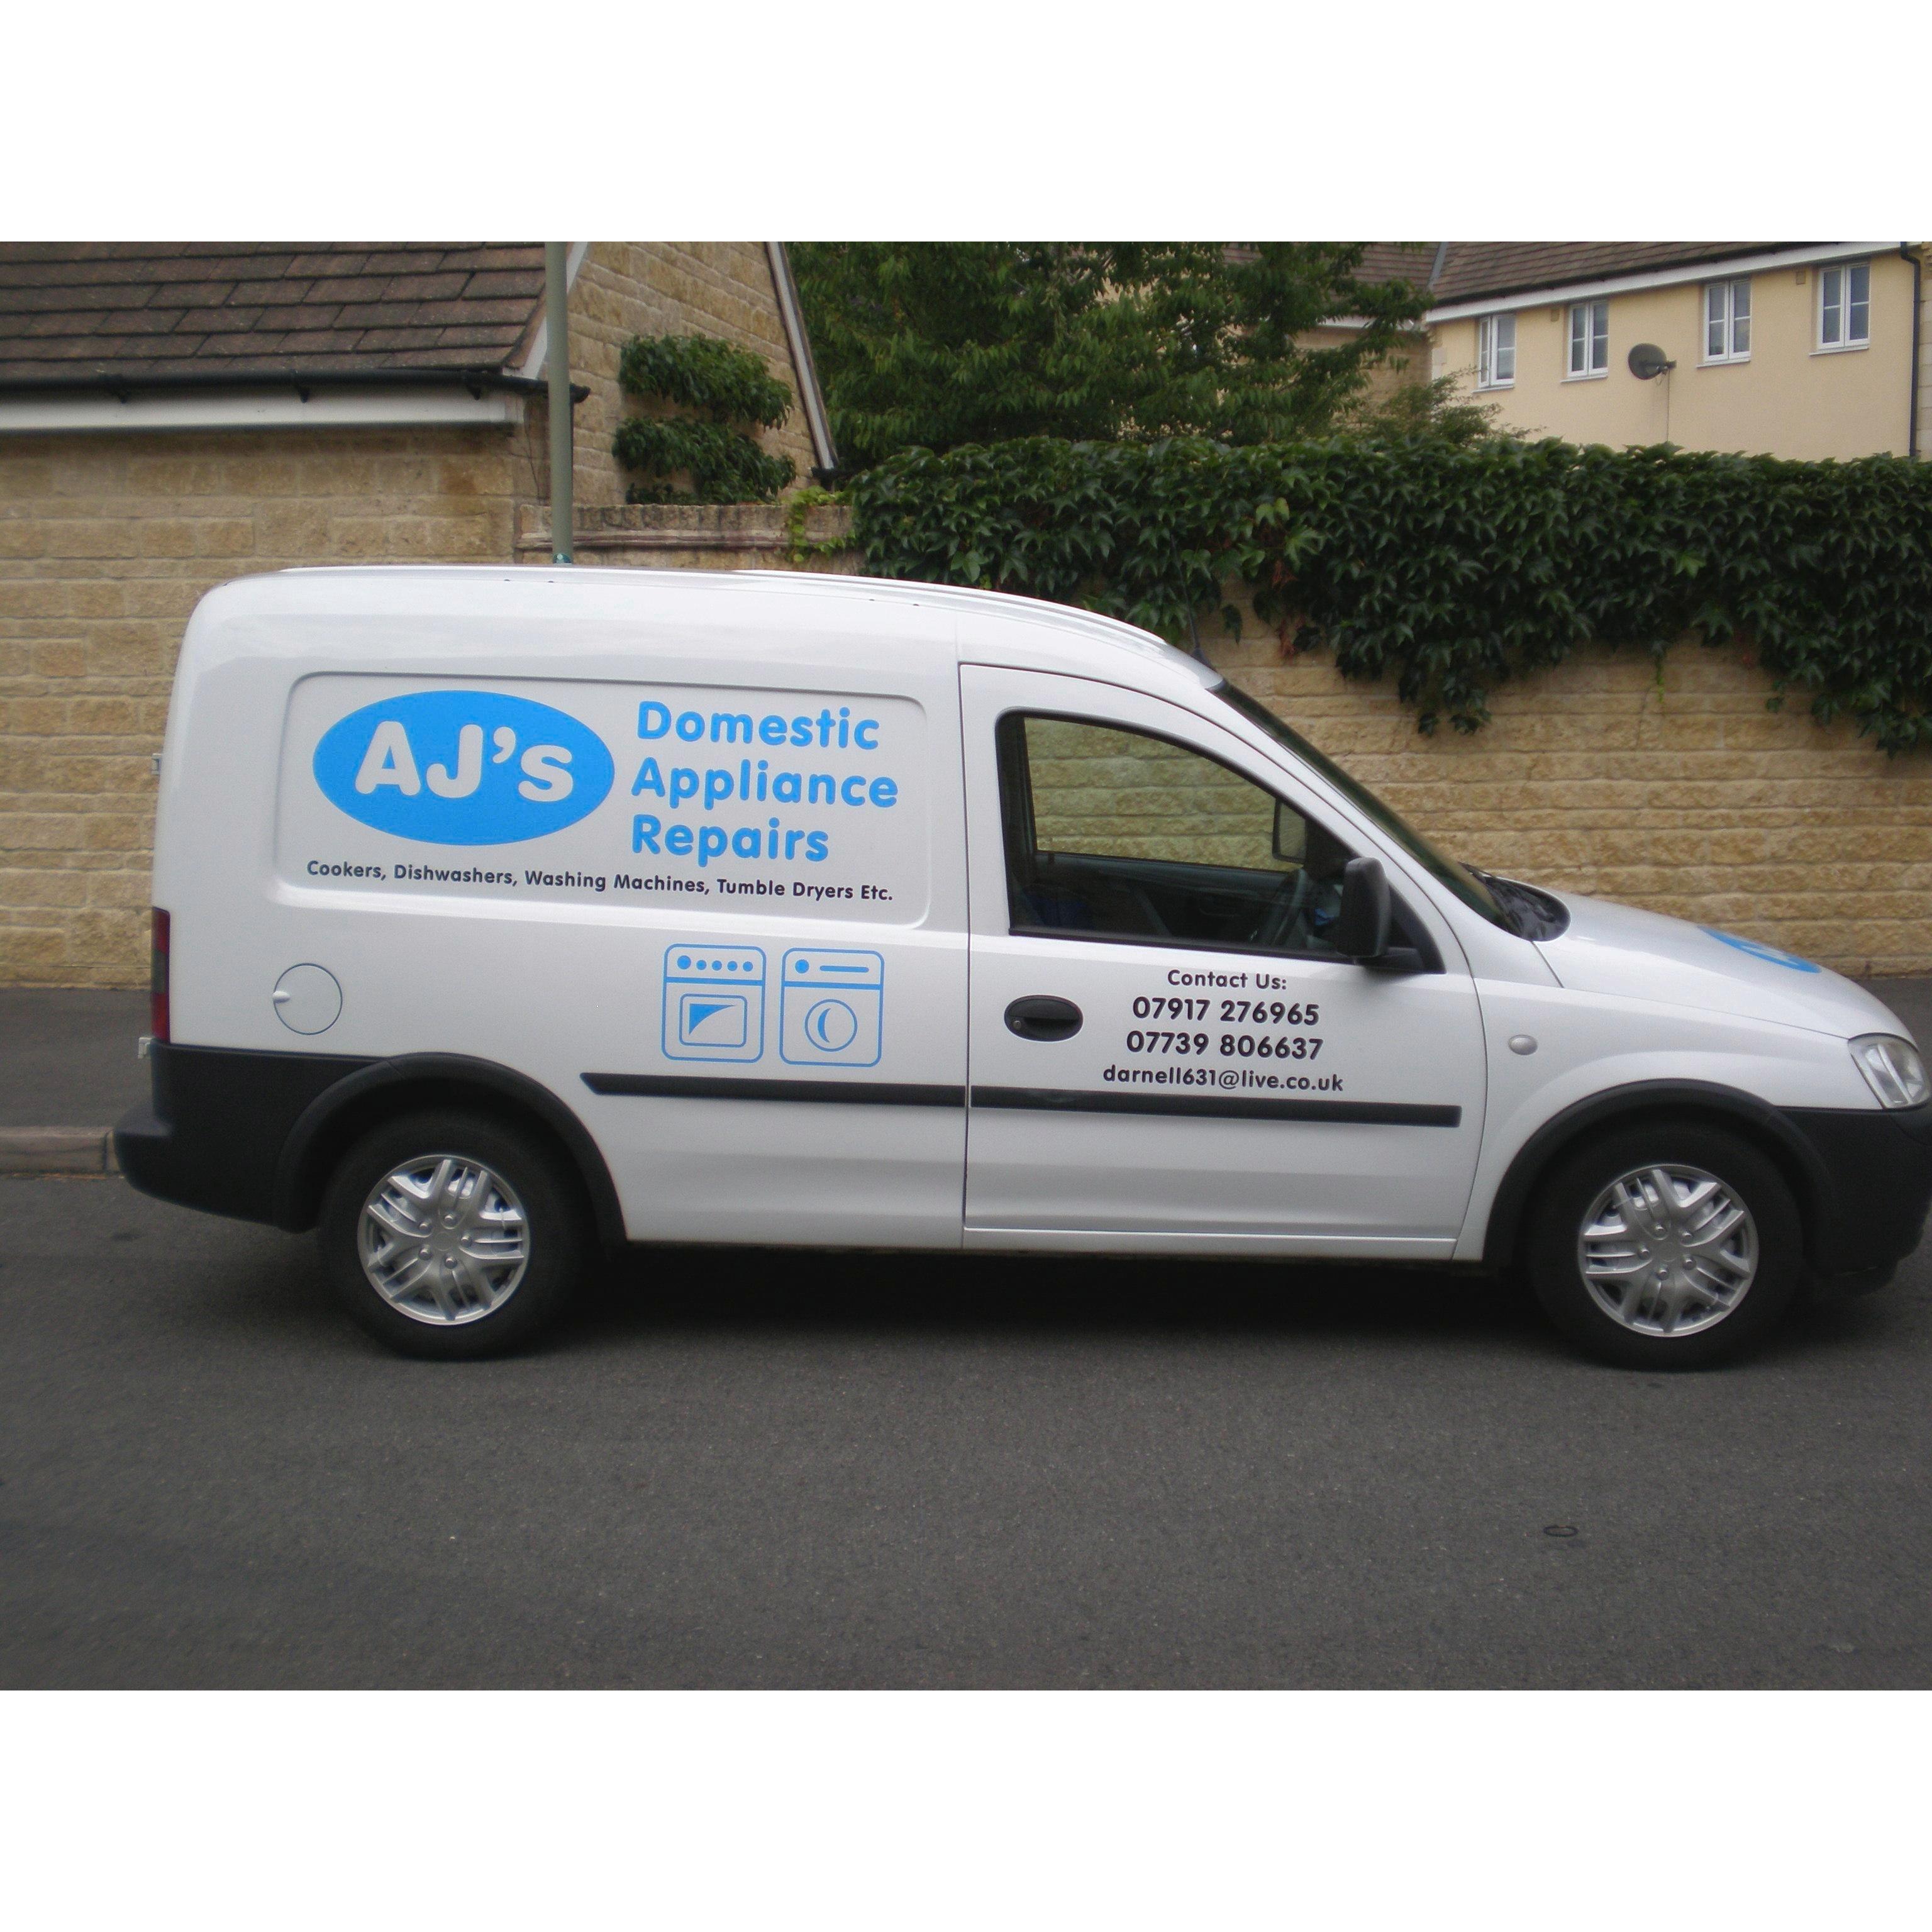 AJ's Domestic Appliance Repairs - Aylesbury, Buckinghamshire HP17 8LQ - 07917 276965 | ShowMeLocal.com